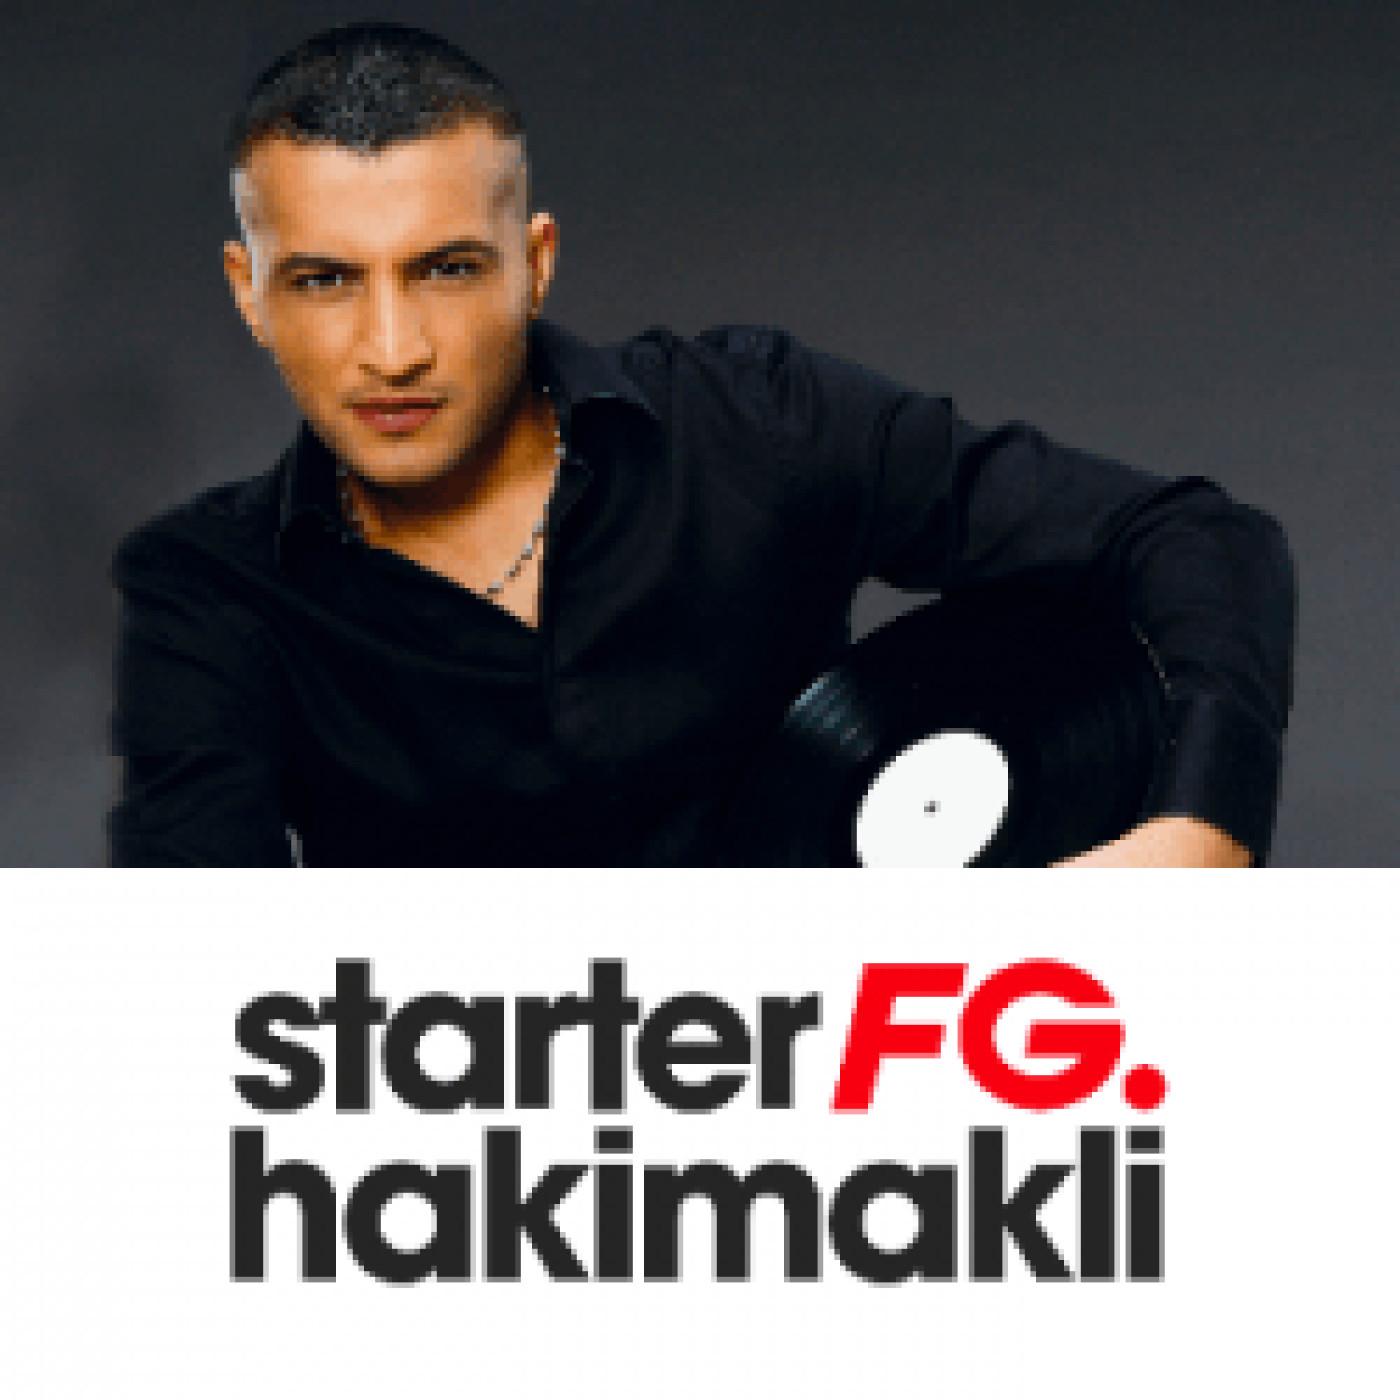 STARTER FG BY HAKIMAKLI JEUDI 17 DECEMBRE 2020